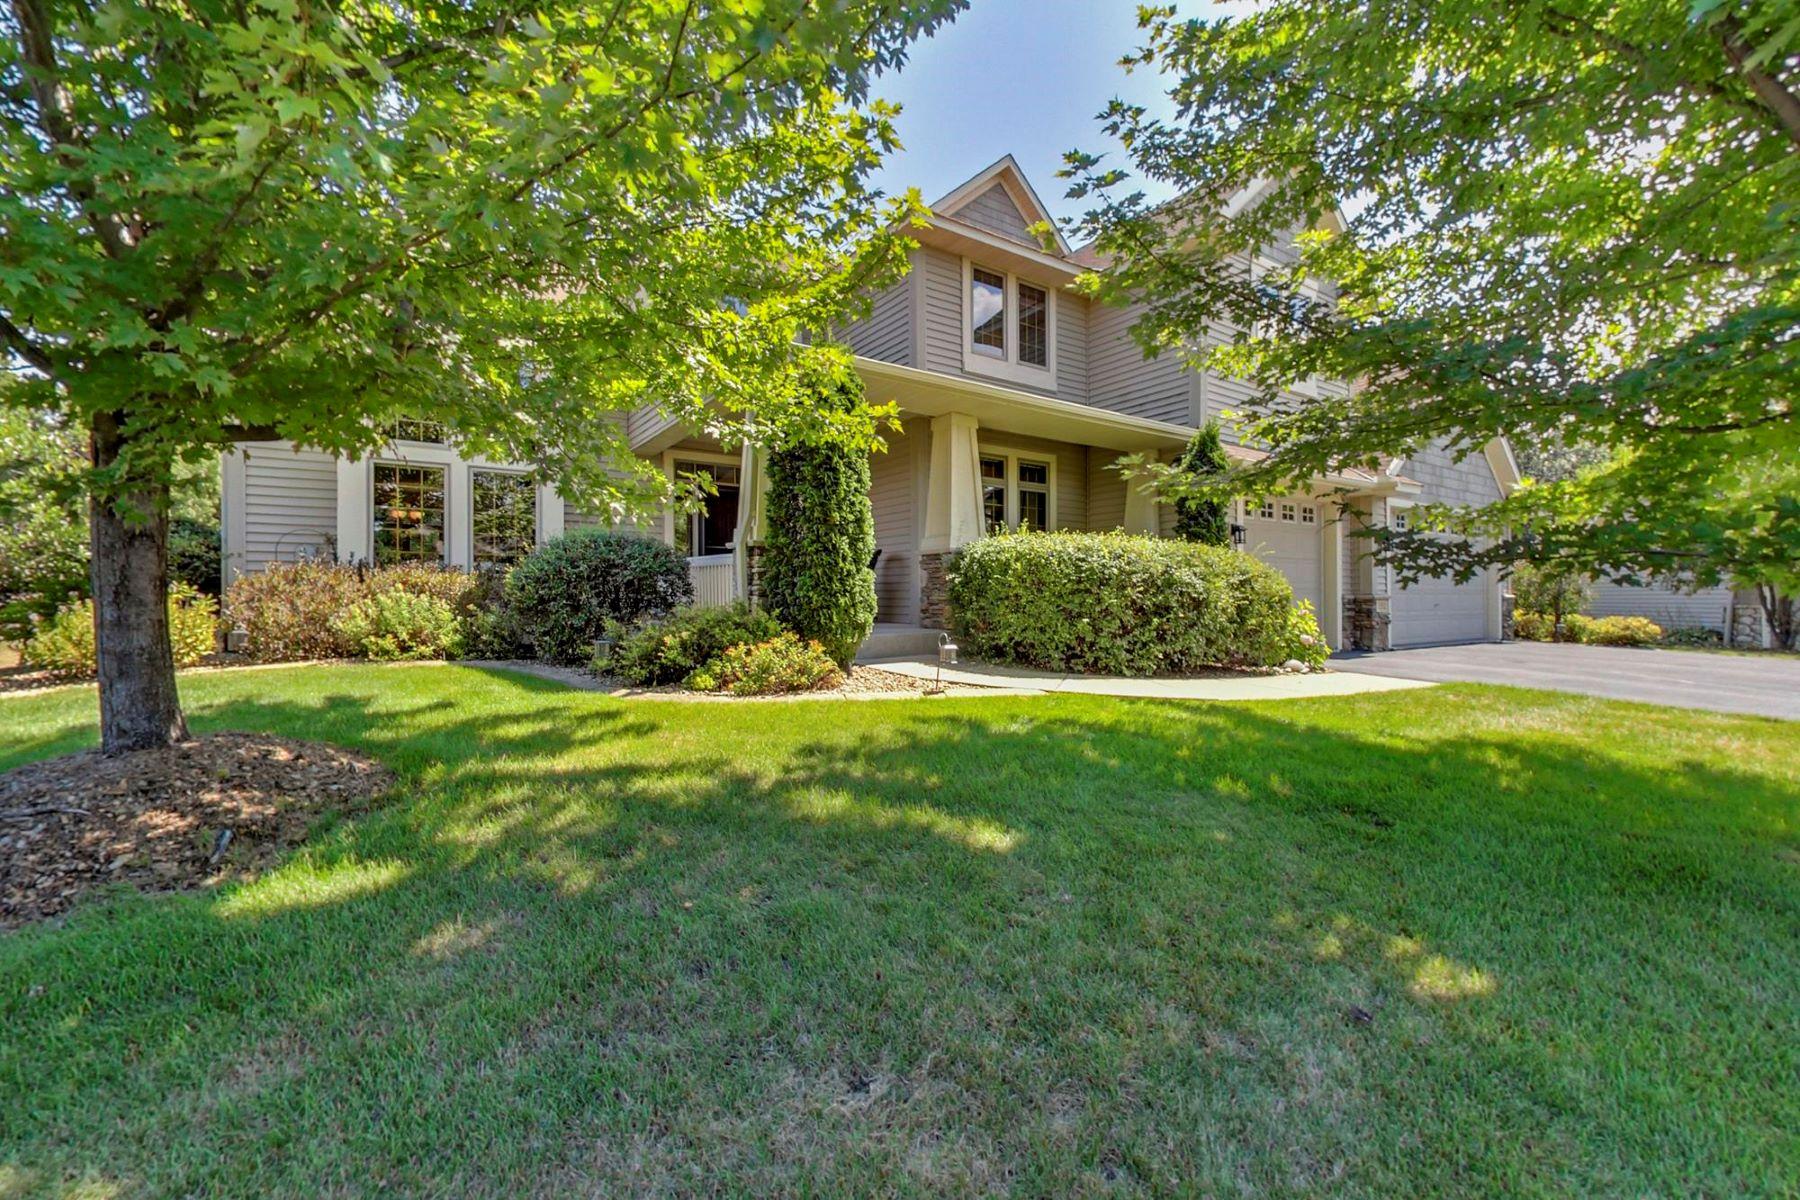 واحد منزل الأسرة للـ Sale في 1552 Stoneridge Circle Long Lake, Minnesota, 55356 United States